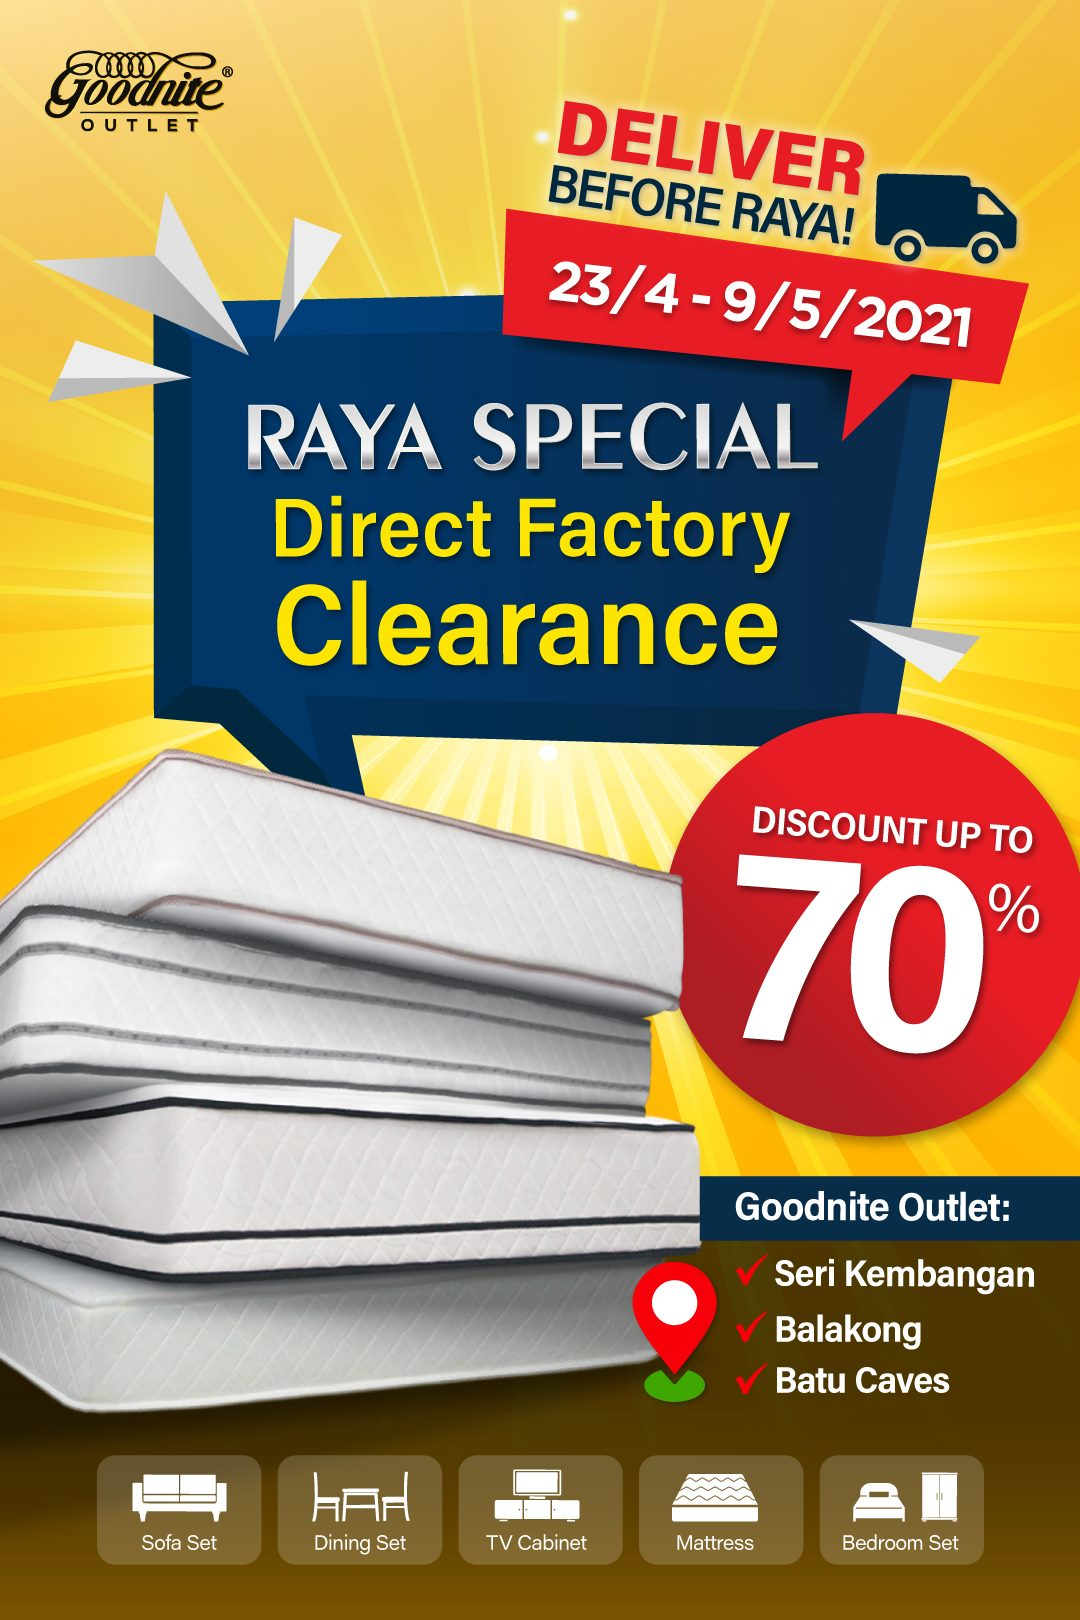 Goodnite-Raya-Clearance-Sale-350x525 - Beddings Furniture Home & Garden & Tools Home Decor Selangor Warehouse Sale & Clearance in Malaysia